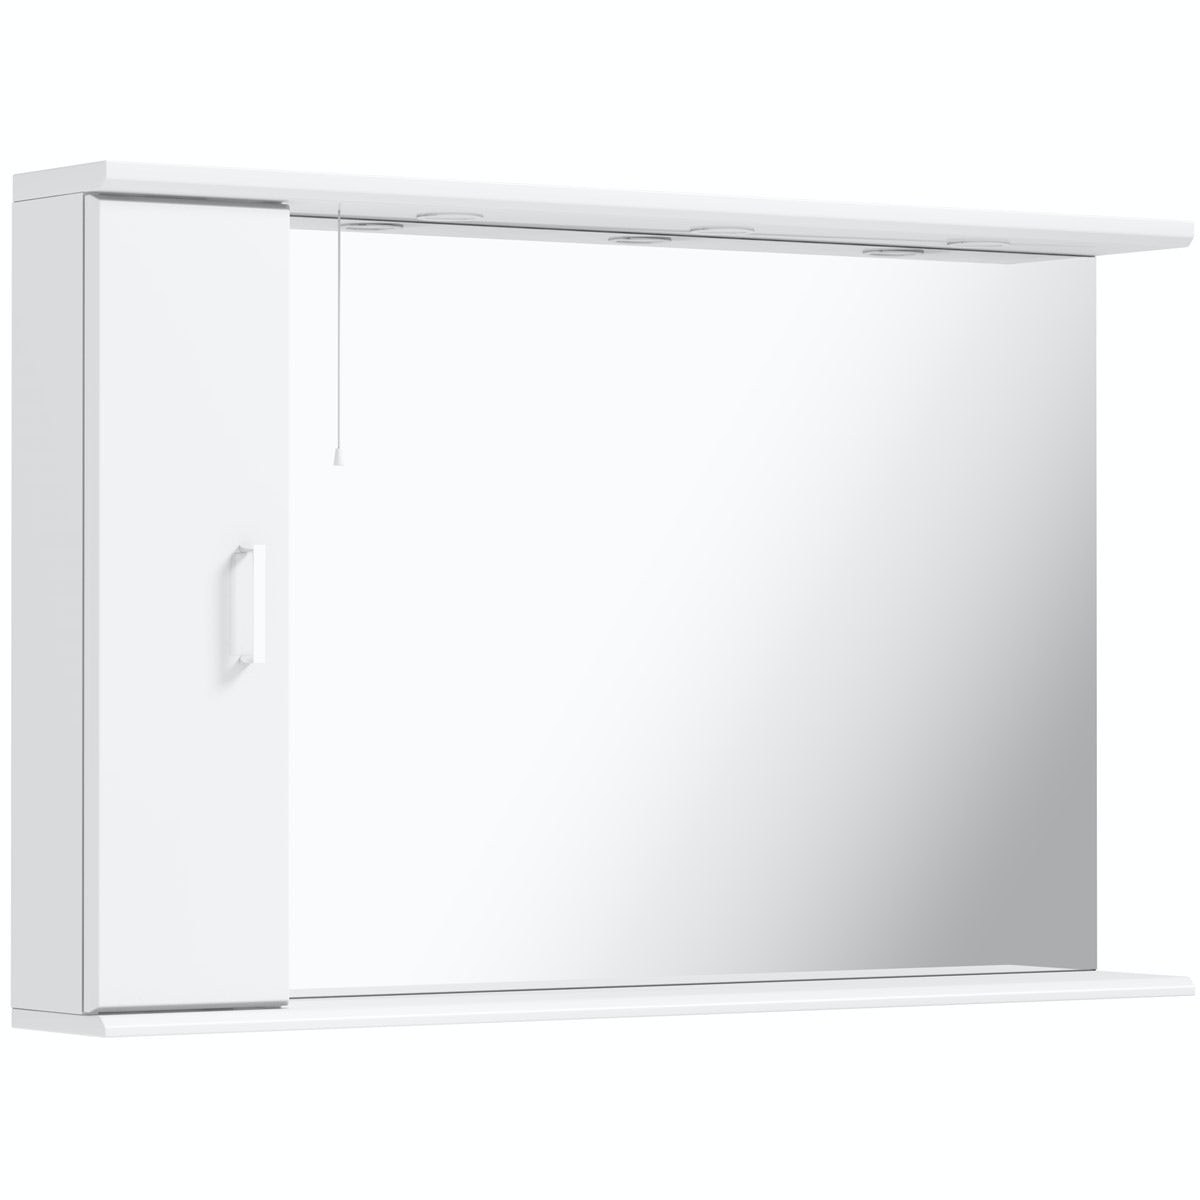 Orchard Eden white illuminated mirror 1200mm